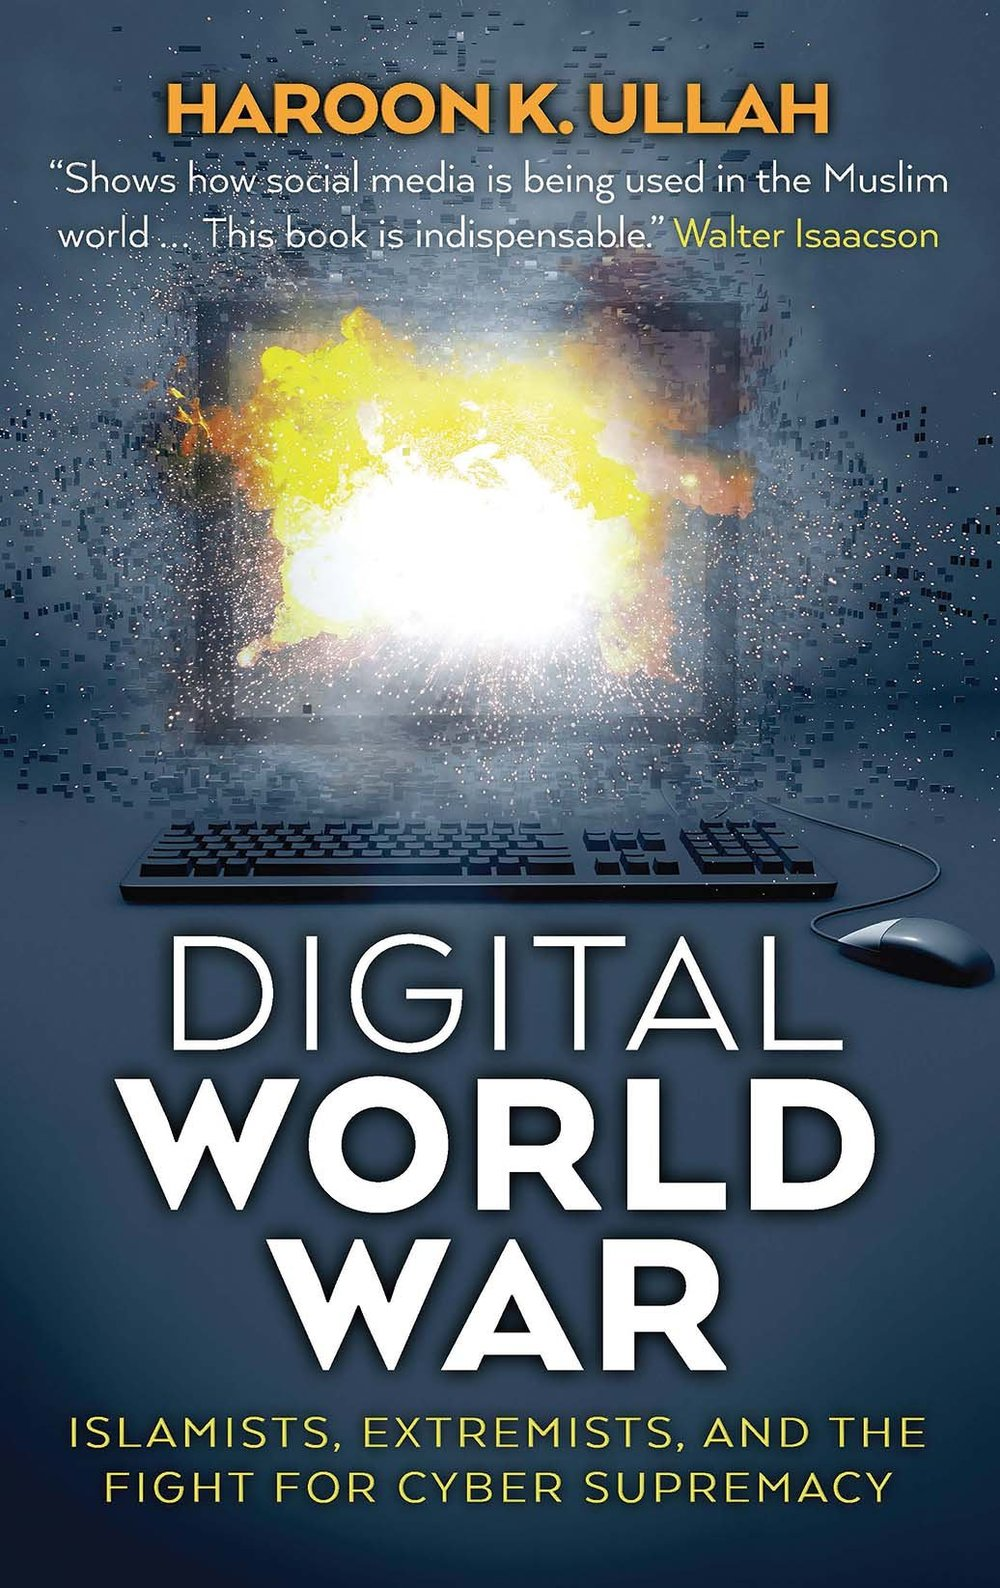 digital world war.jpg